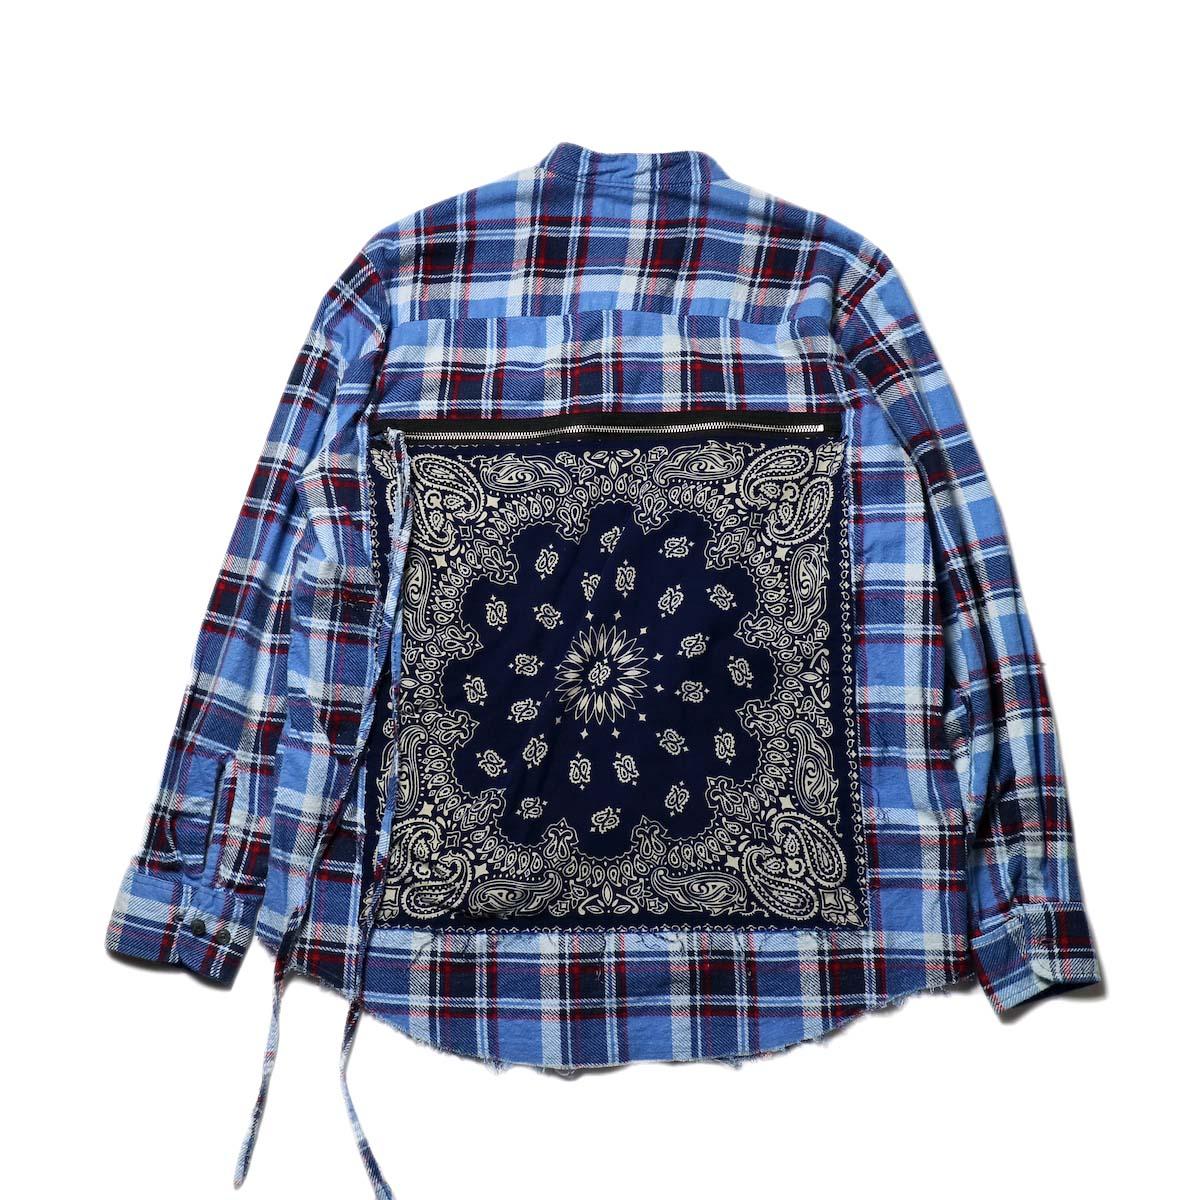 OLD PARK / Bandana Bag Shirt Flannel (B)カットオフ